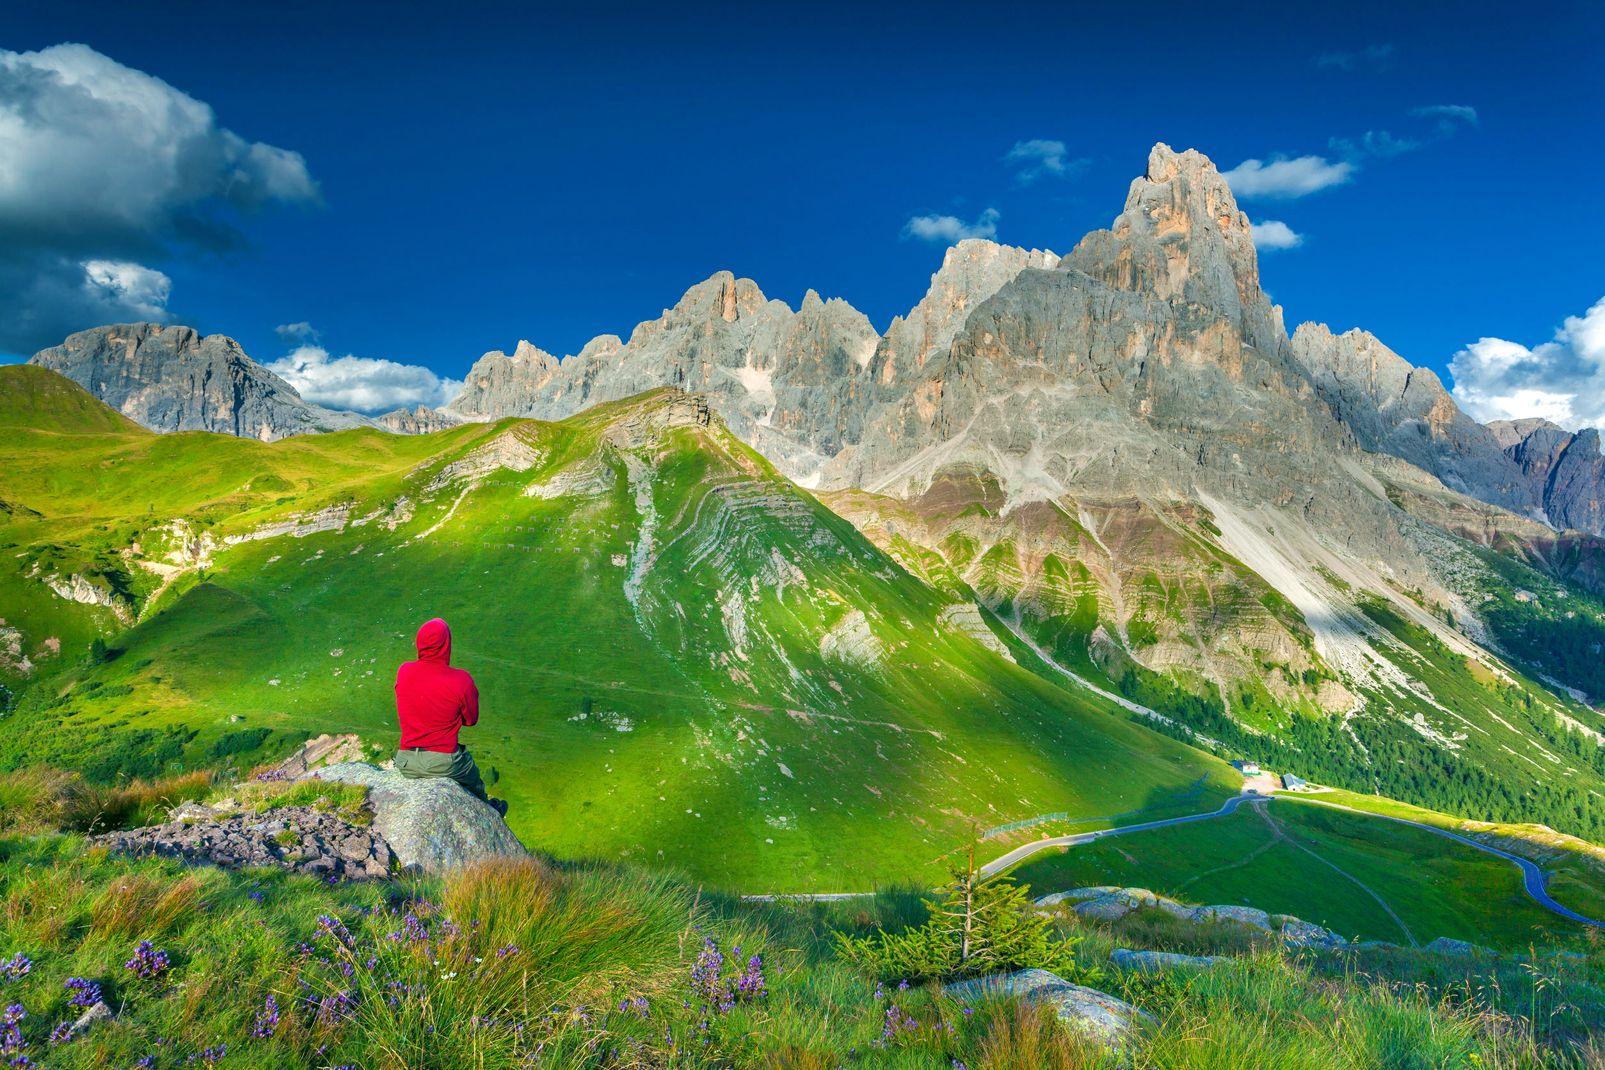 Trentin-Haut-Adige, Italie, Trentin-Haut-Adige, Italie